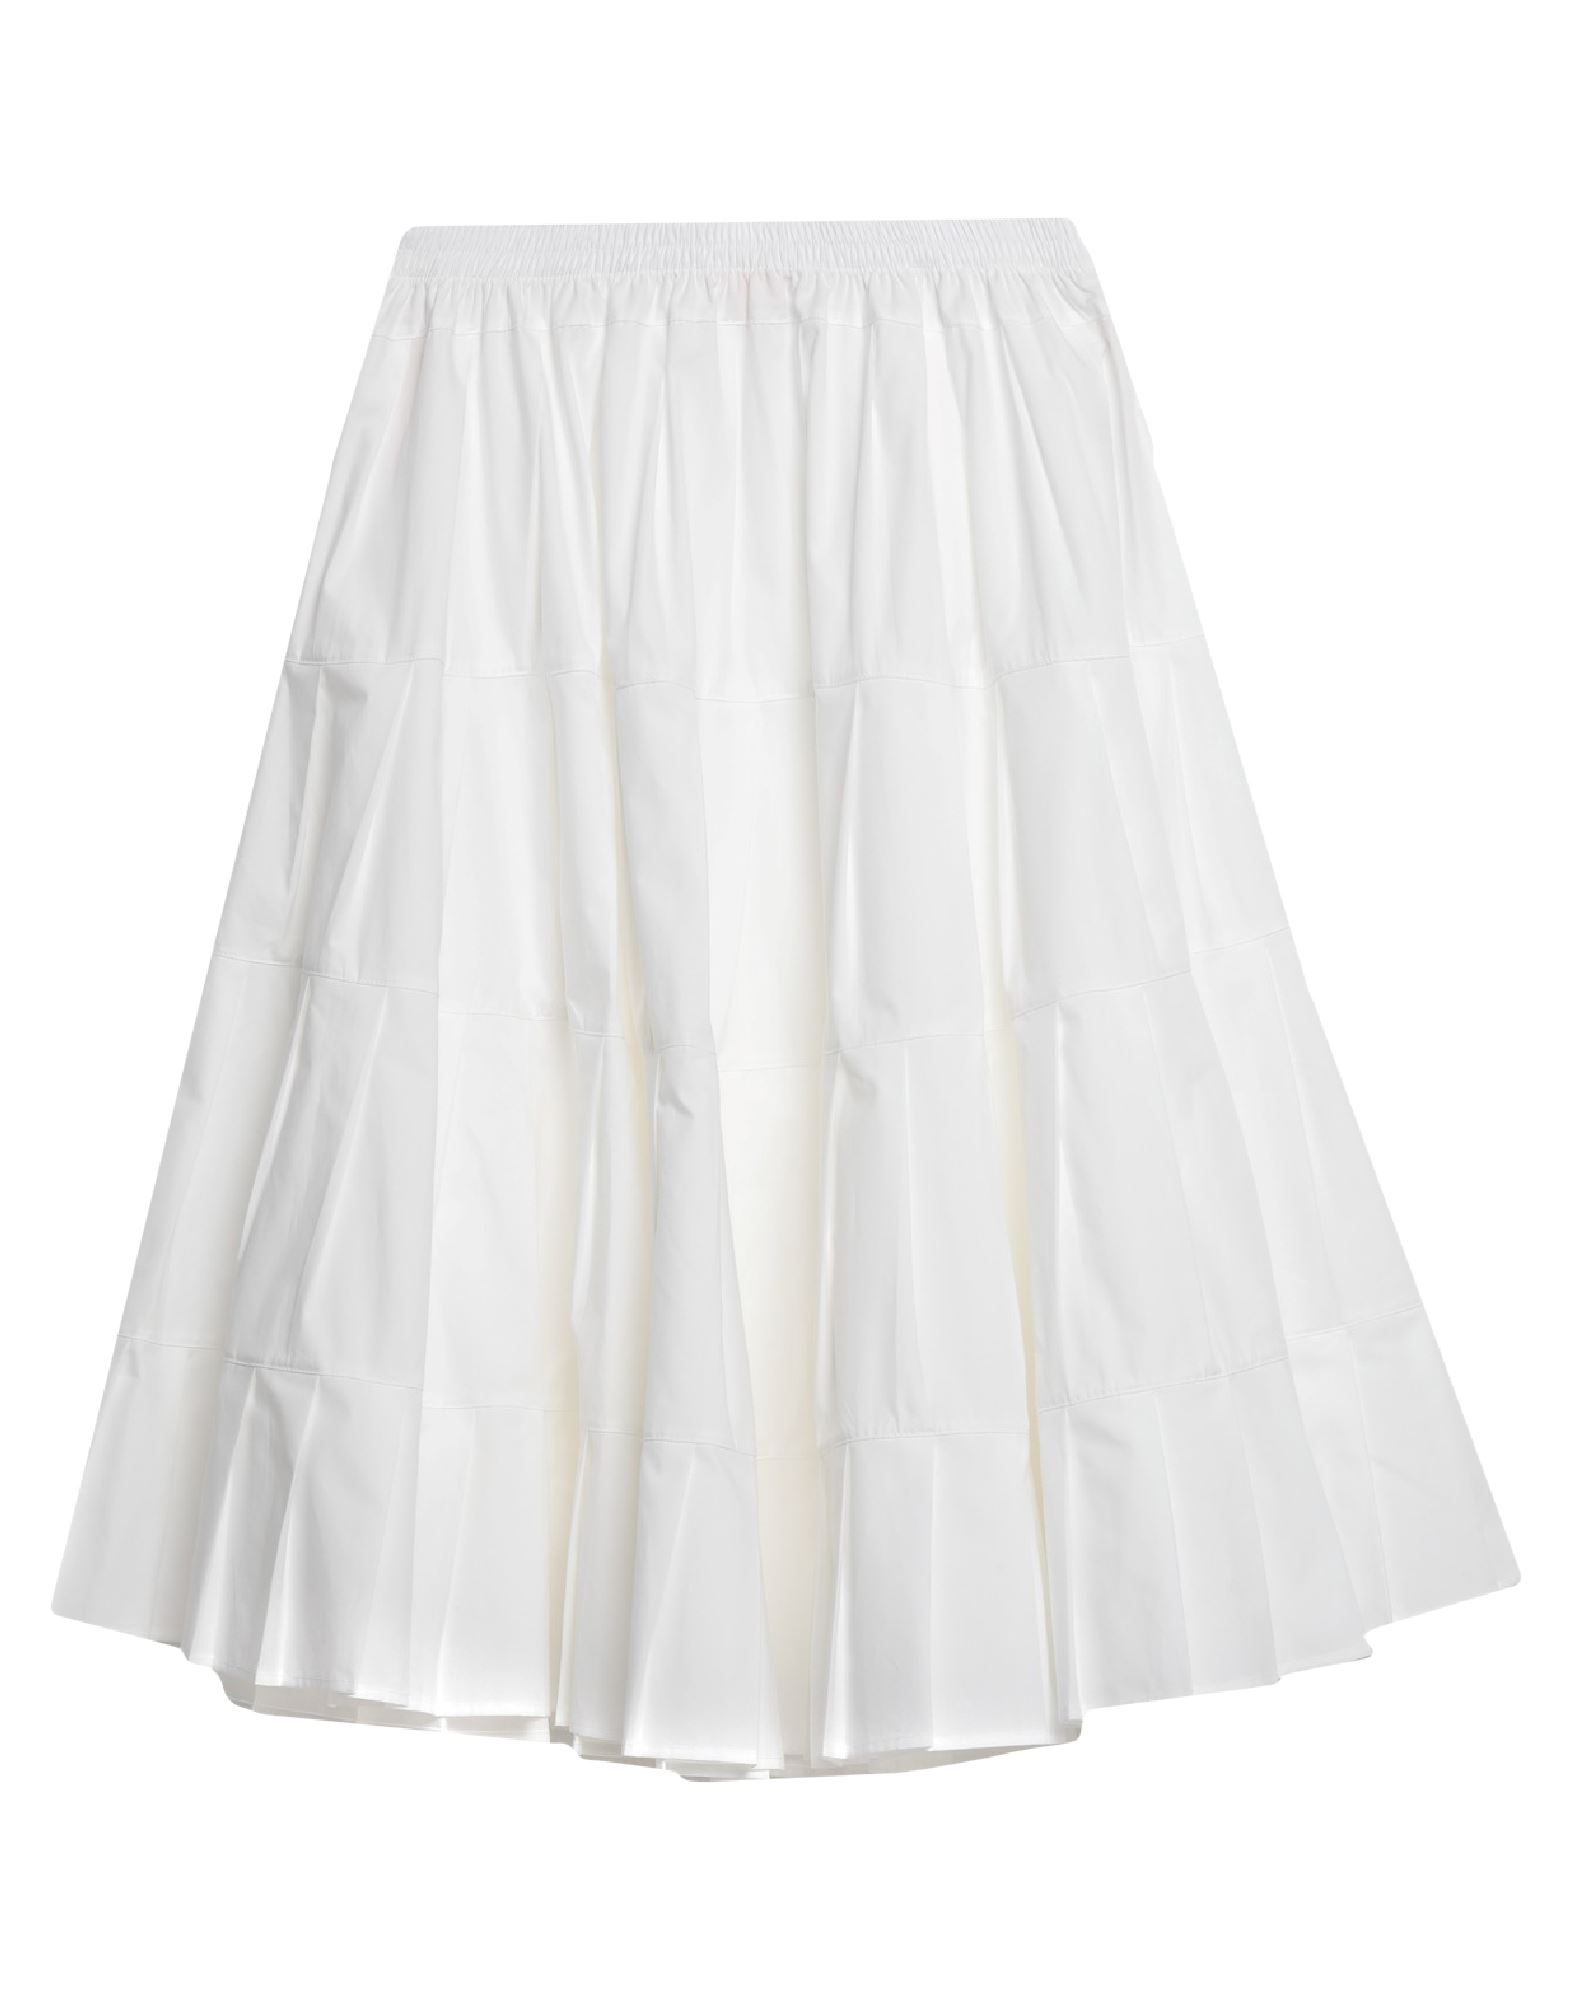 Фото - SEE BY CHLOÉ Юбка до колена chloé юбка до колена